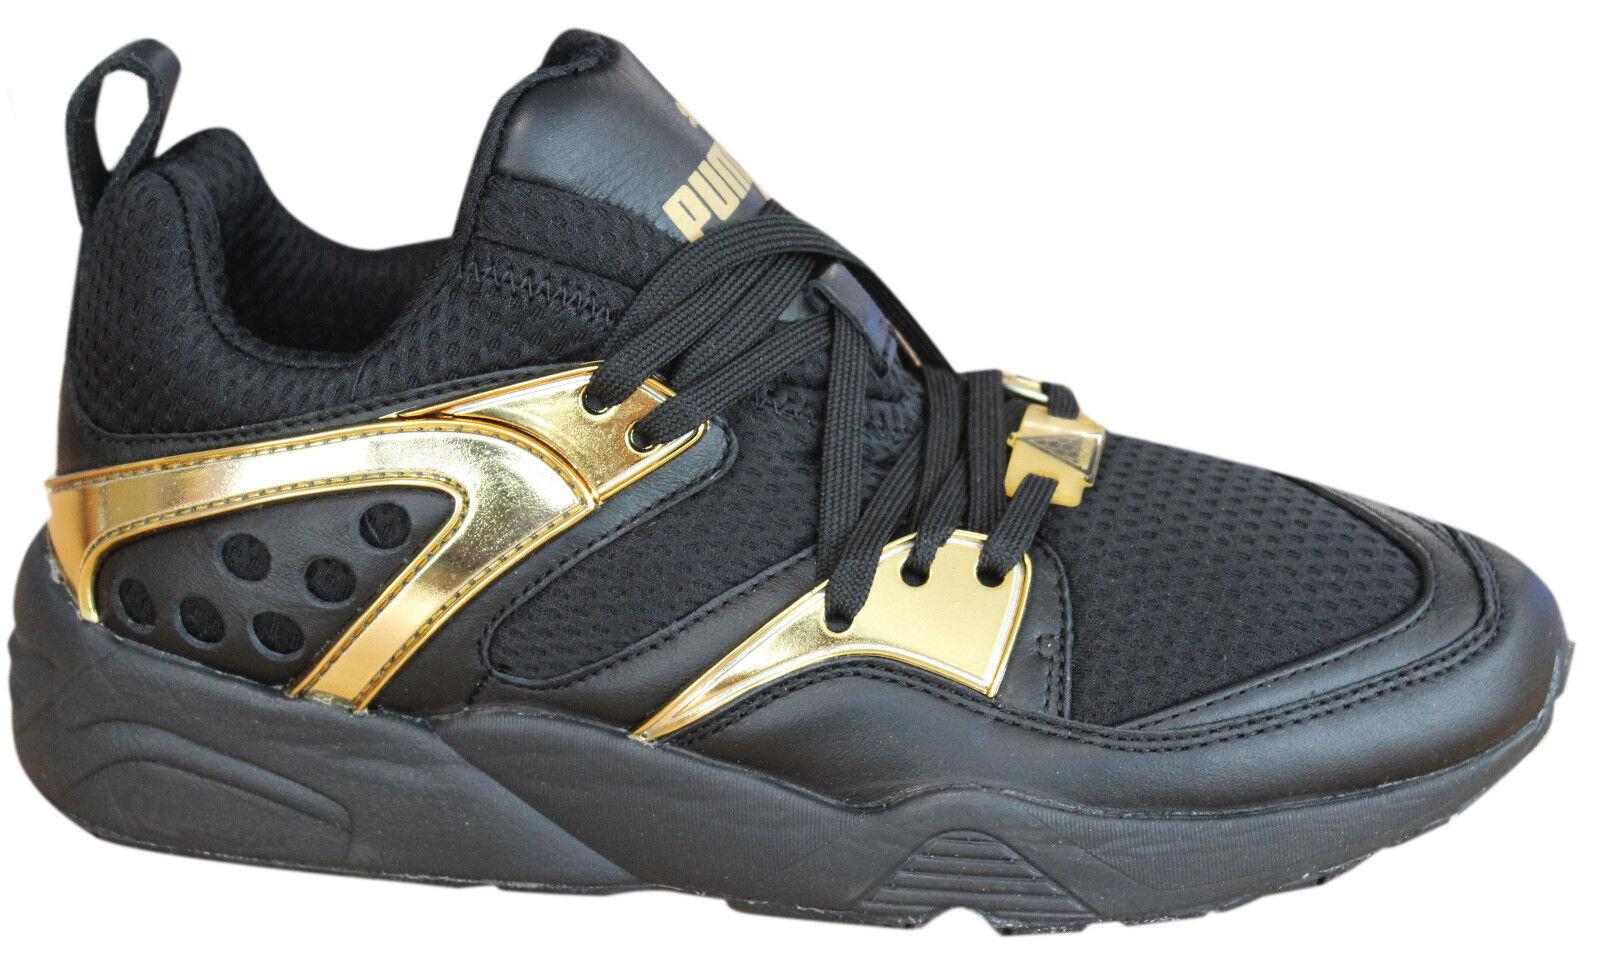 Puma Blaze Of Glory Metallic Oro Hombre Trainers Lace Up Zapatos Negro Oro Metallic 61851 02 M3 f63938